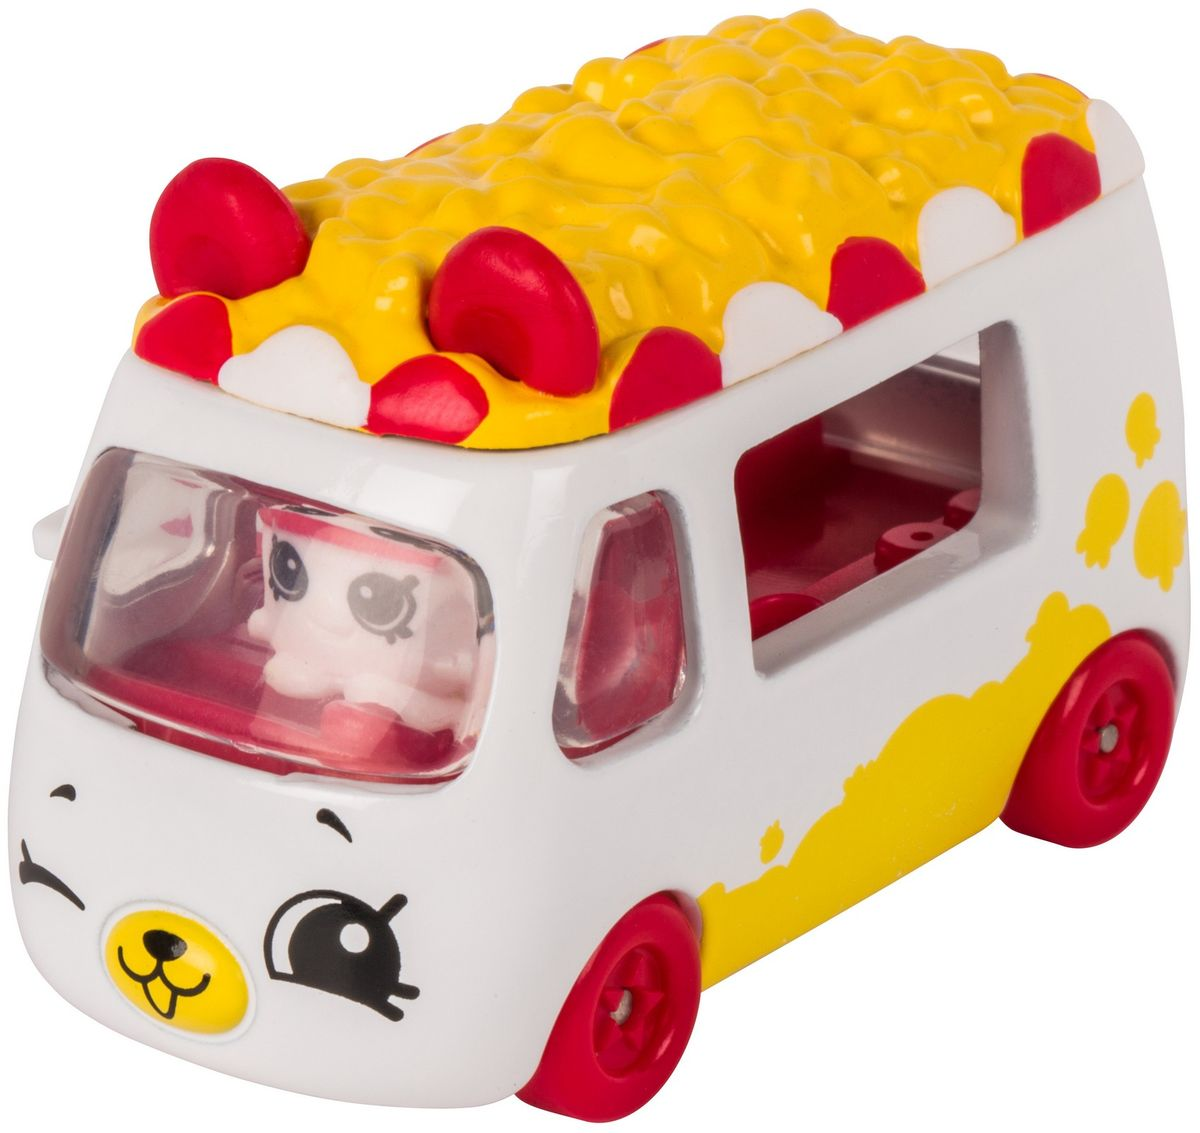 Moose Игровой набор Cutie Car с мини-фигуркой Shopkins S1 56594/ast56742 moose брелок poppy corn shopkins